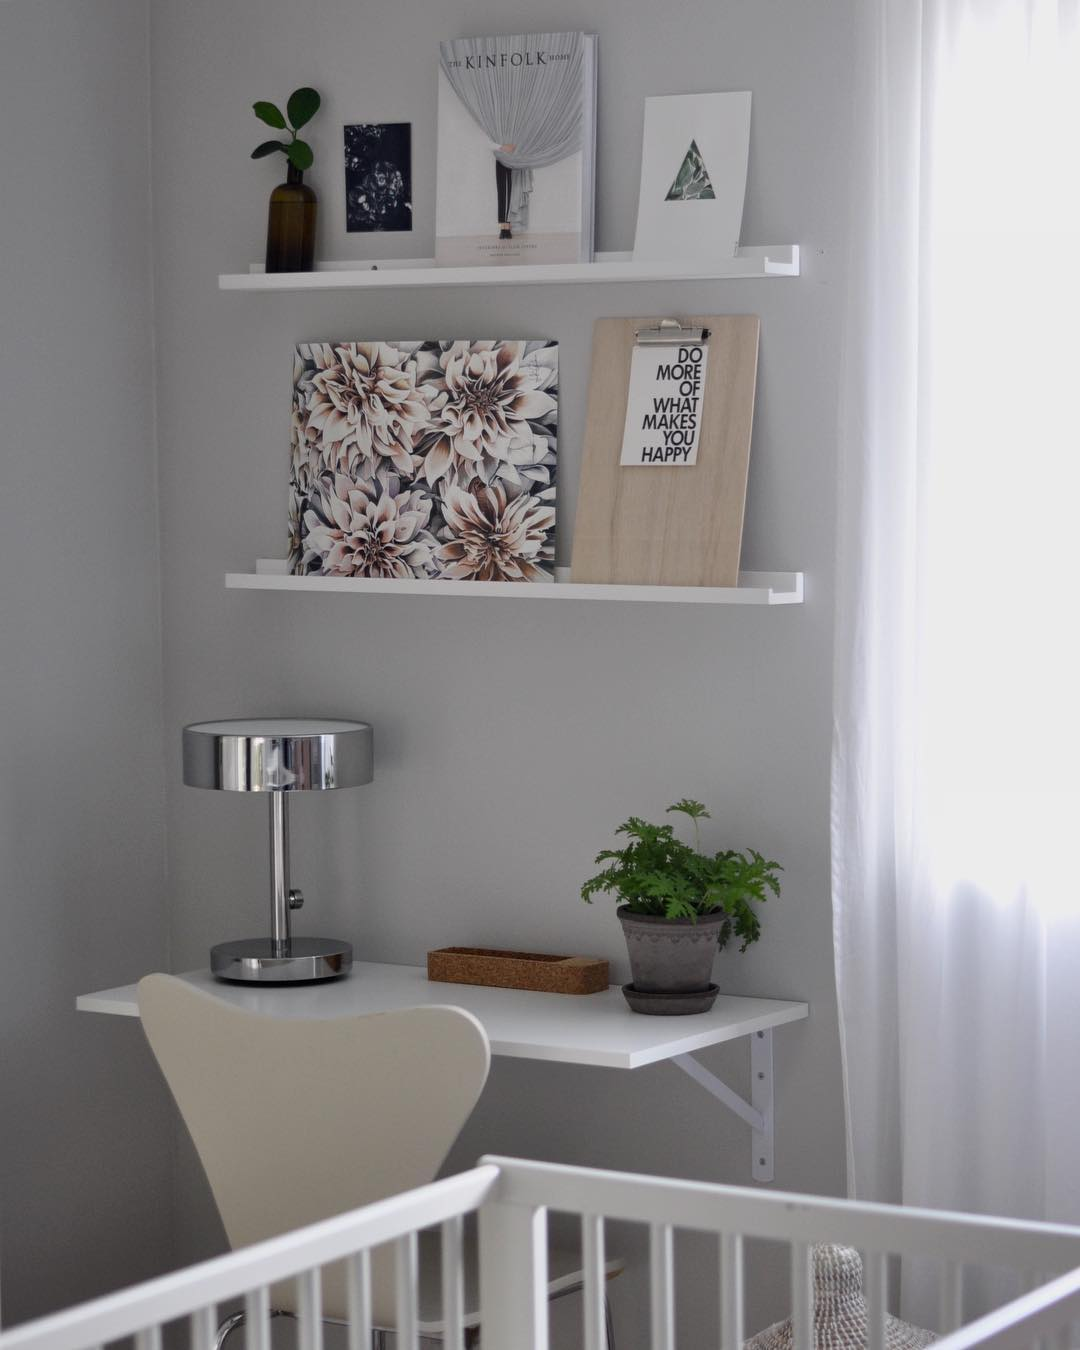 Work space! josefinegunhamres fantastiska print Dahlia passade ju som etthellip